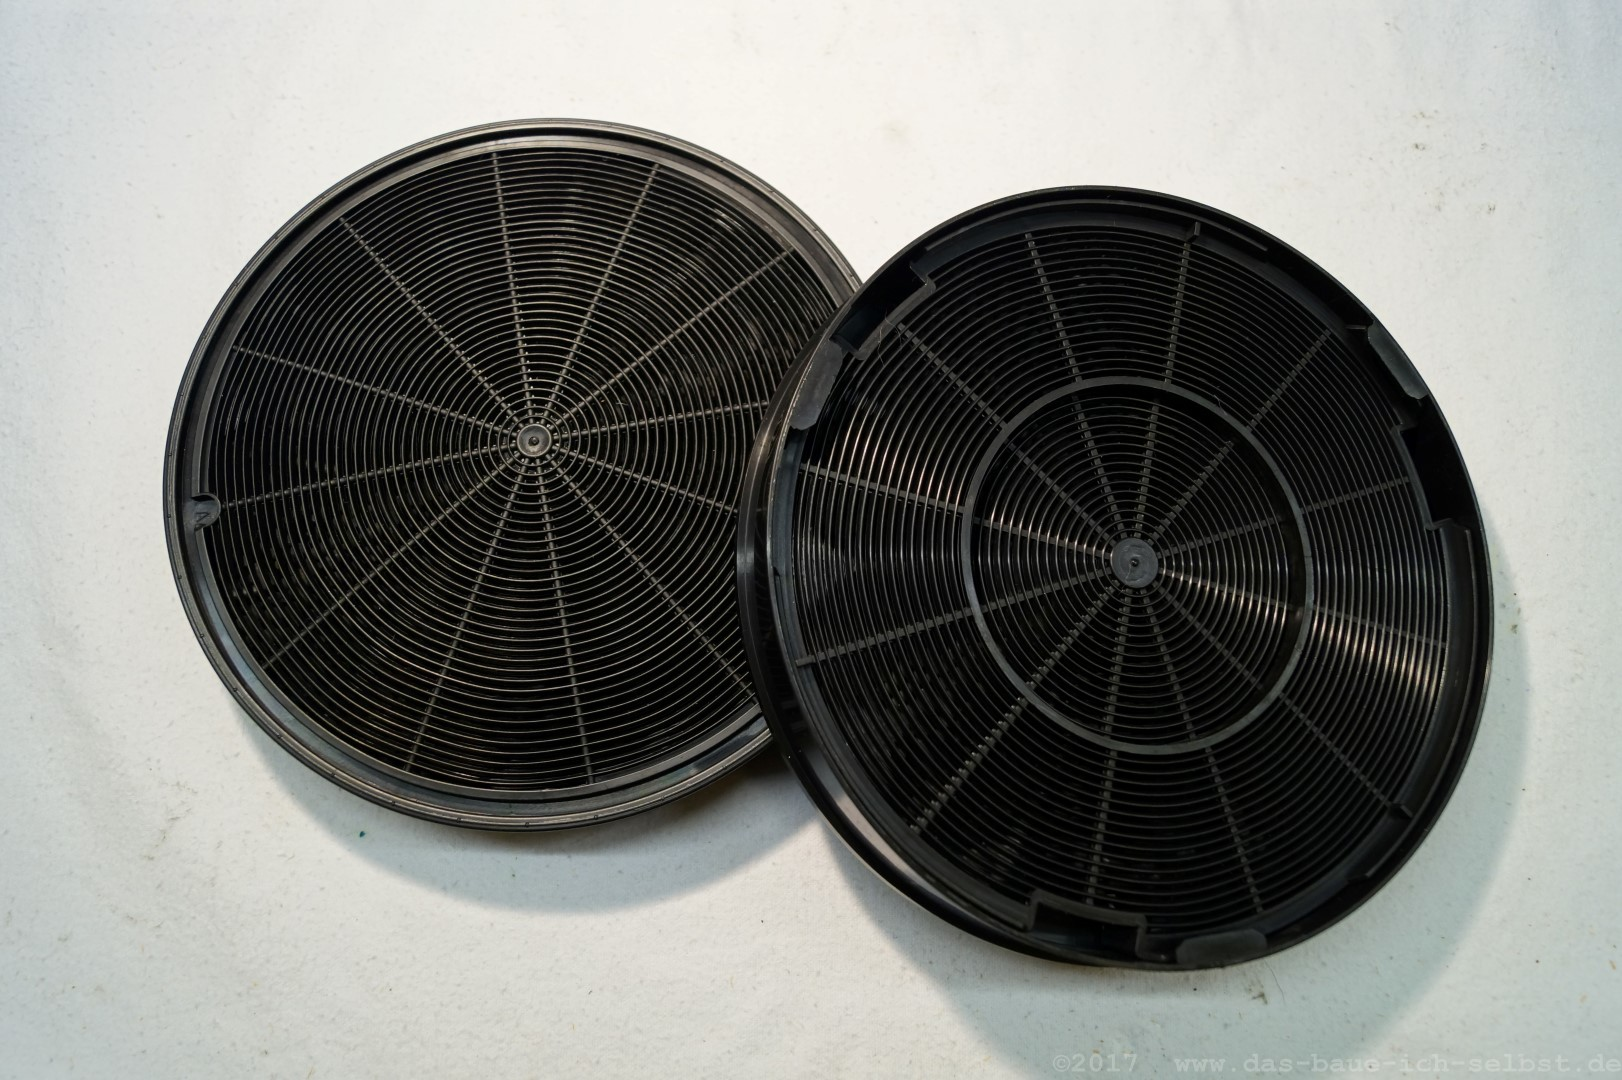 Filtervlies filtergranulat der dunstabzugshaube austauschen